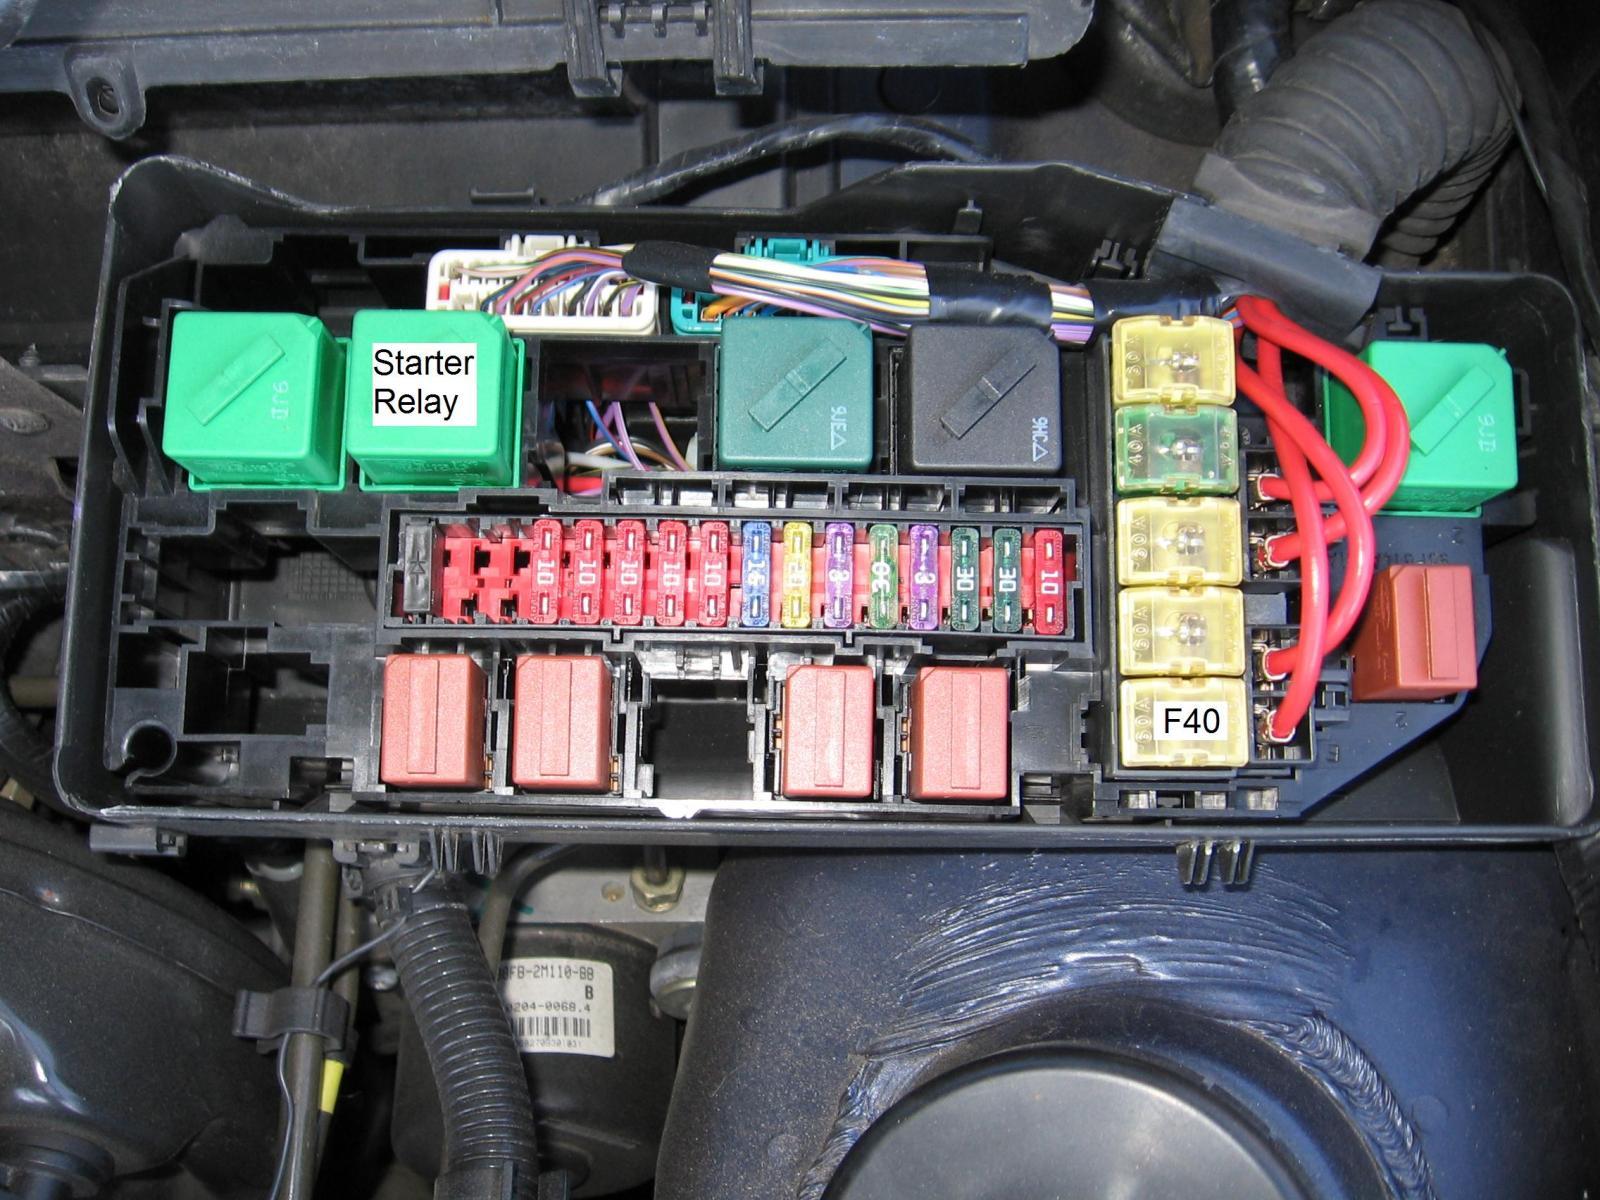 hight resolution of ford puma fuse box location wiring diagram pass ford puma fuse box diagram uk ford puma fuse box